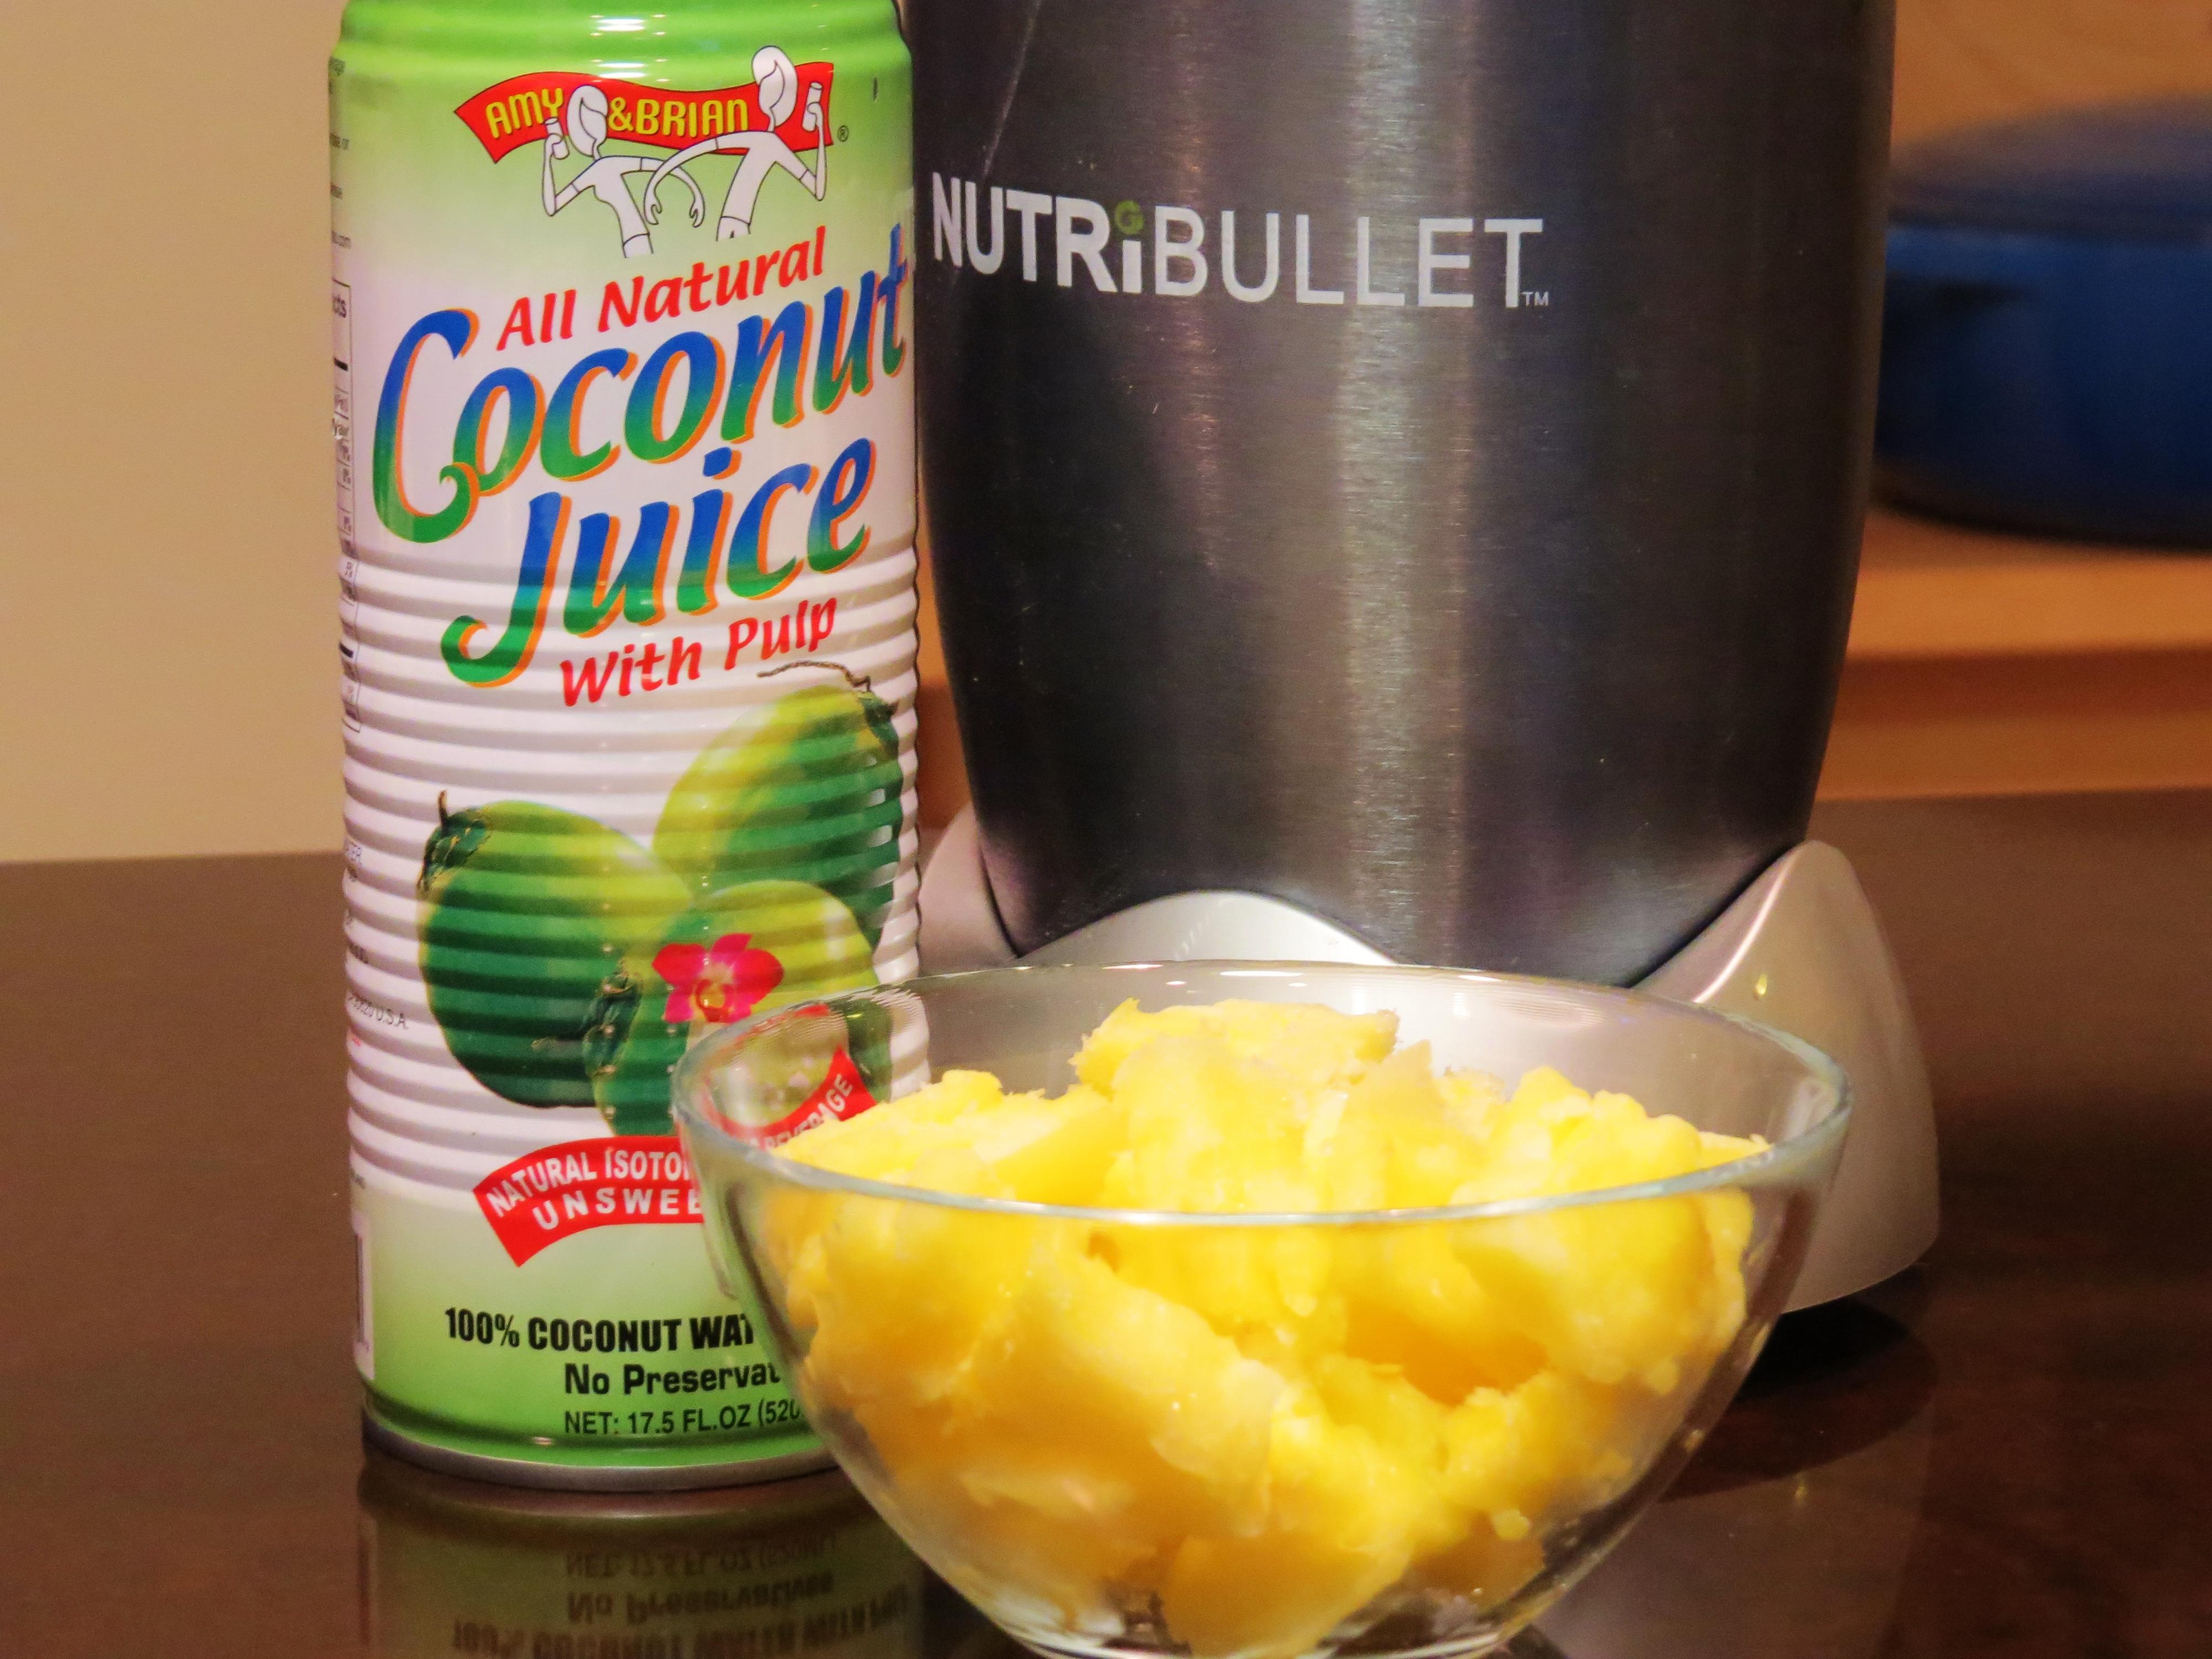 2 ingredient sorbet in my NutriBullet. Only frozen pineapples and coconut juice